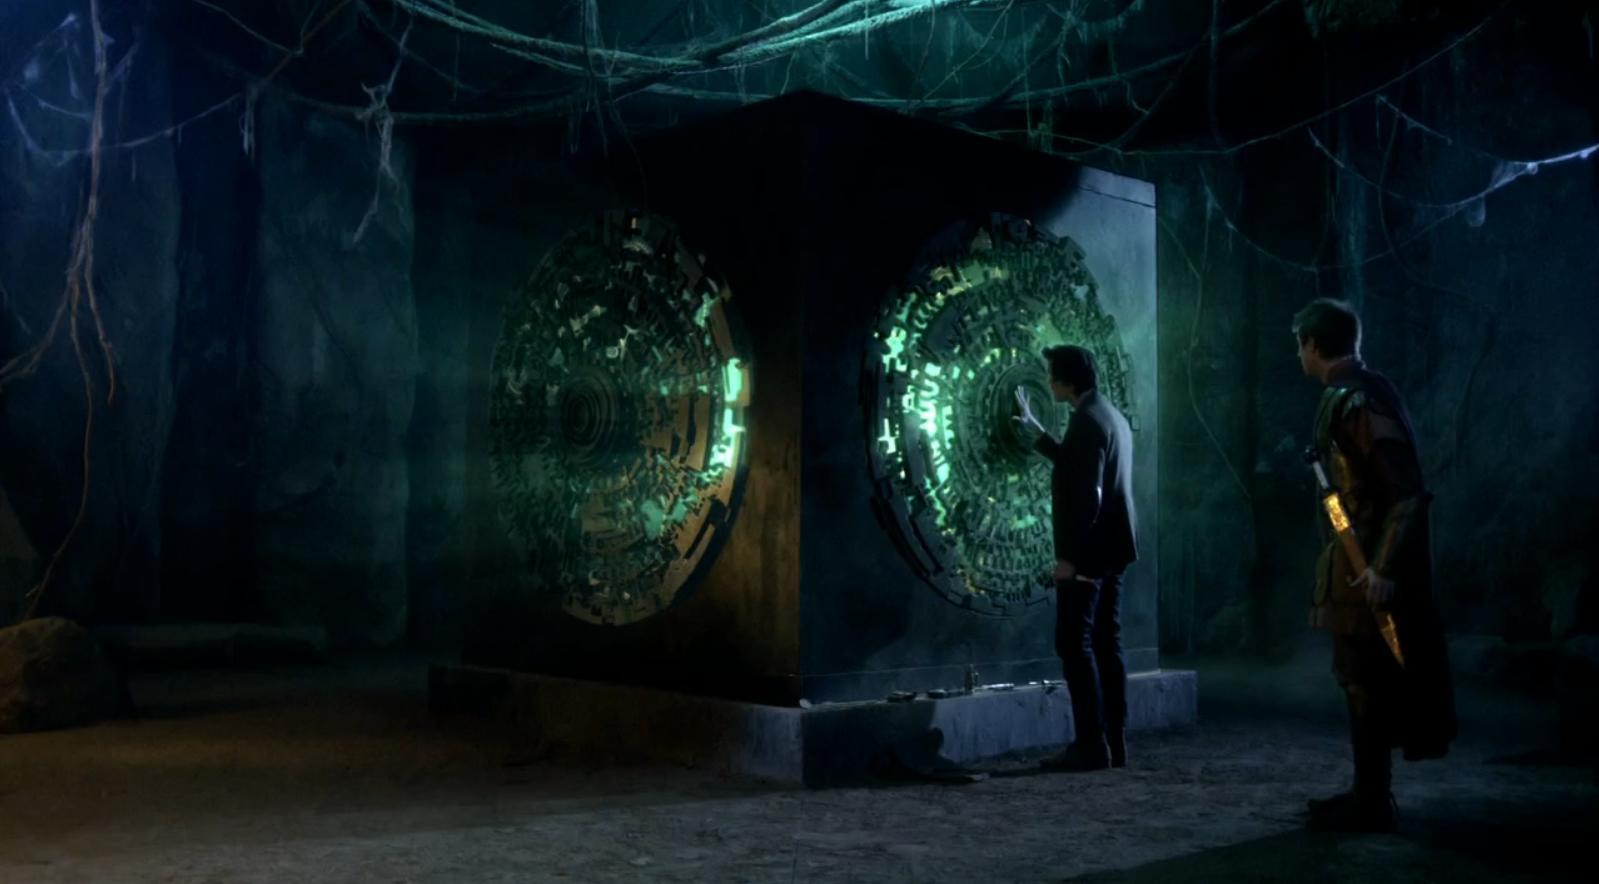 Tardis Wallpaper Hd The Inside Trekker Doctor Who 5 12 The Pandorica Opens Review